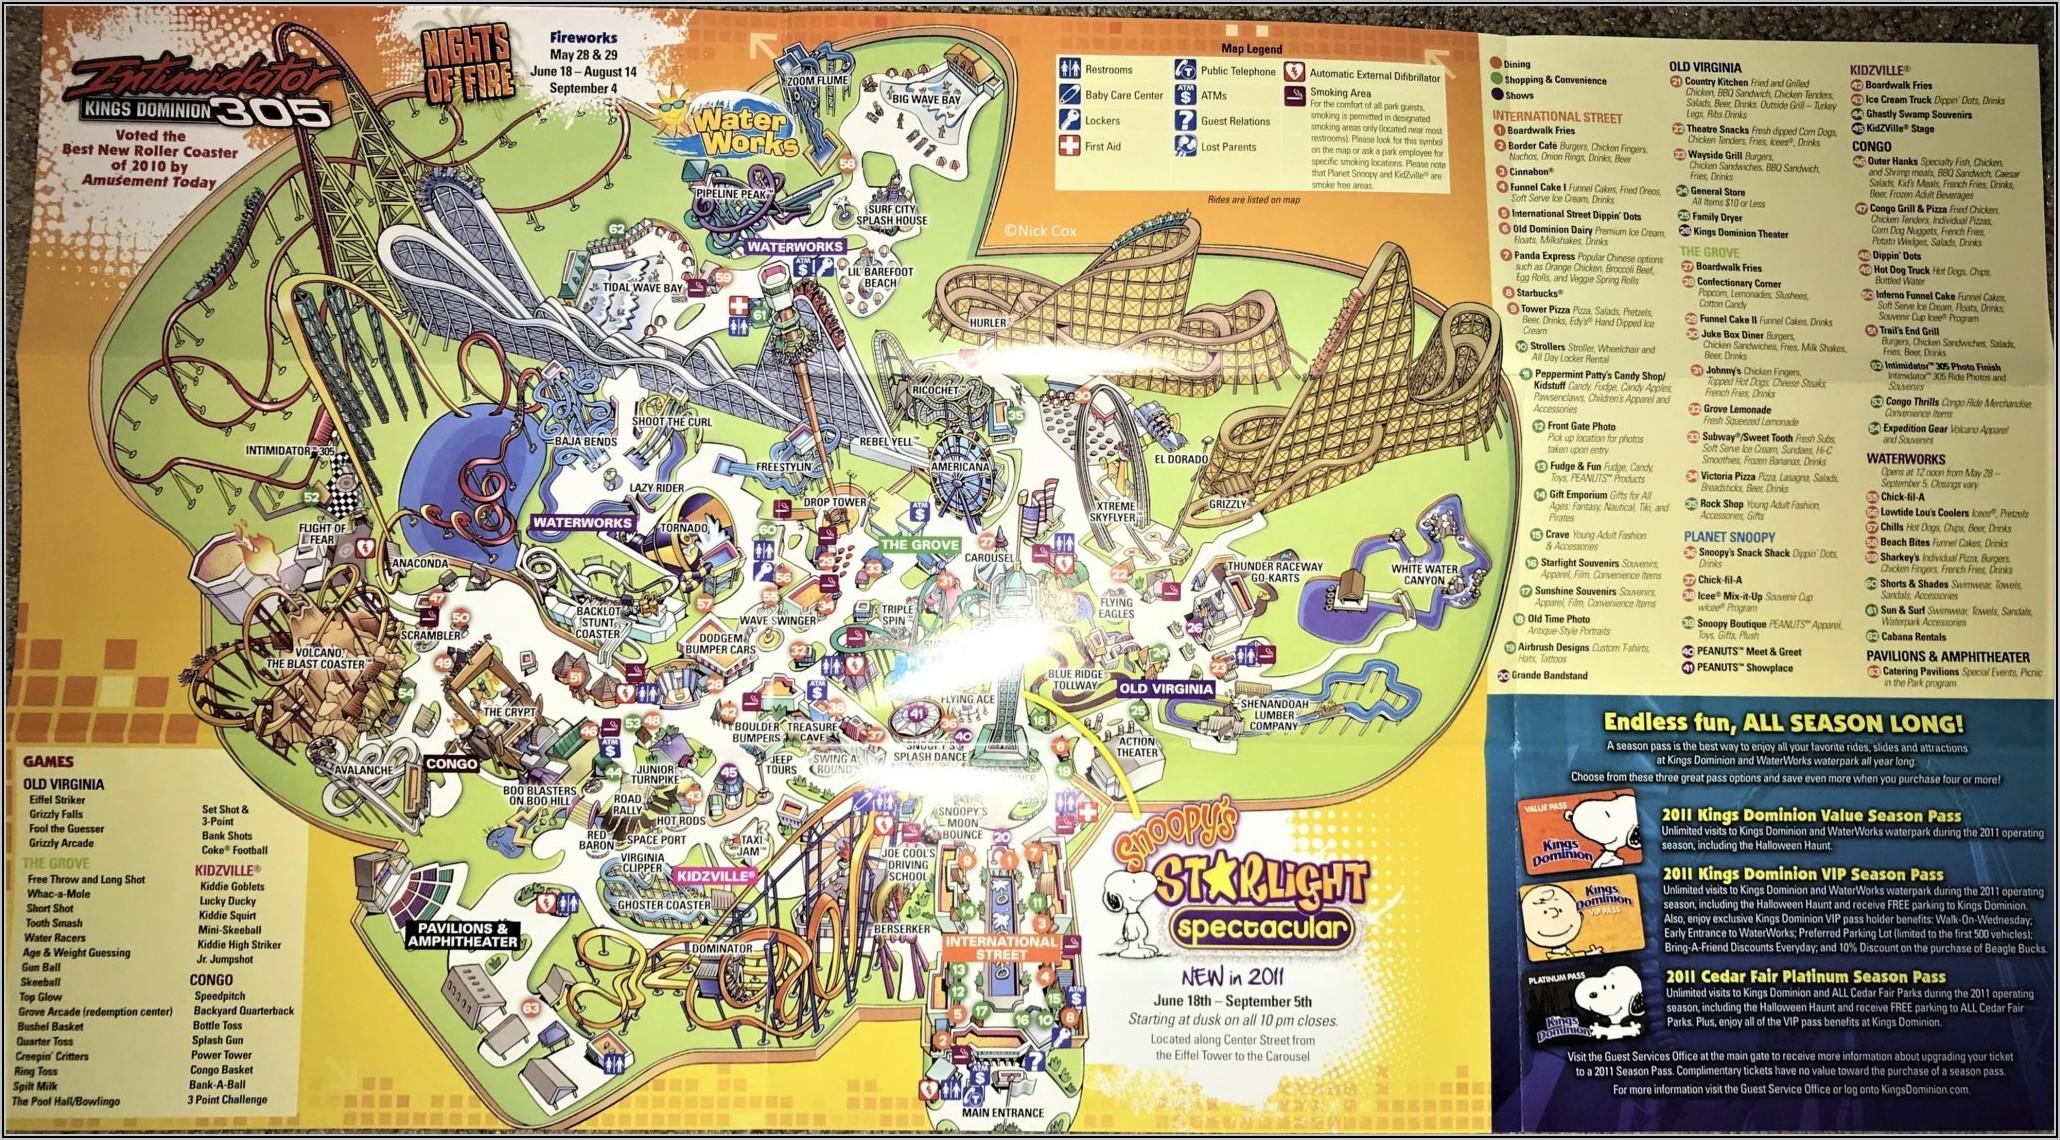 Kings Dominion Haunt Map 2019